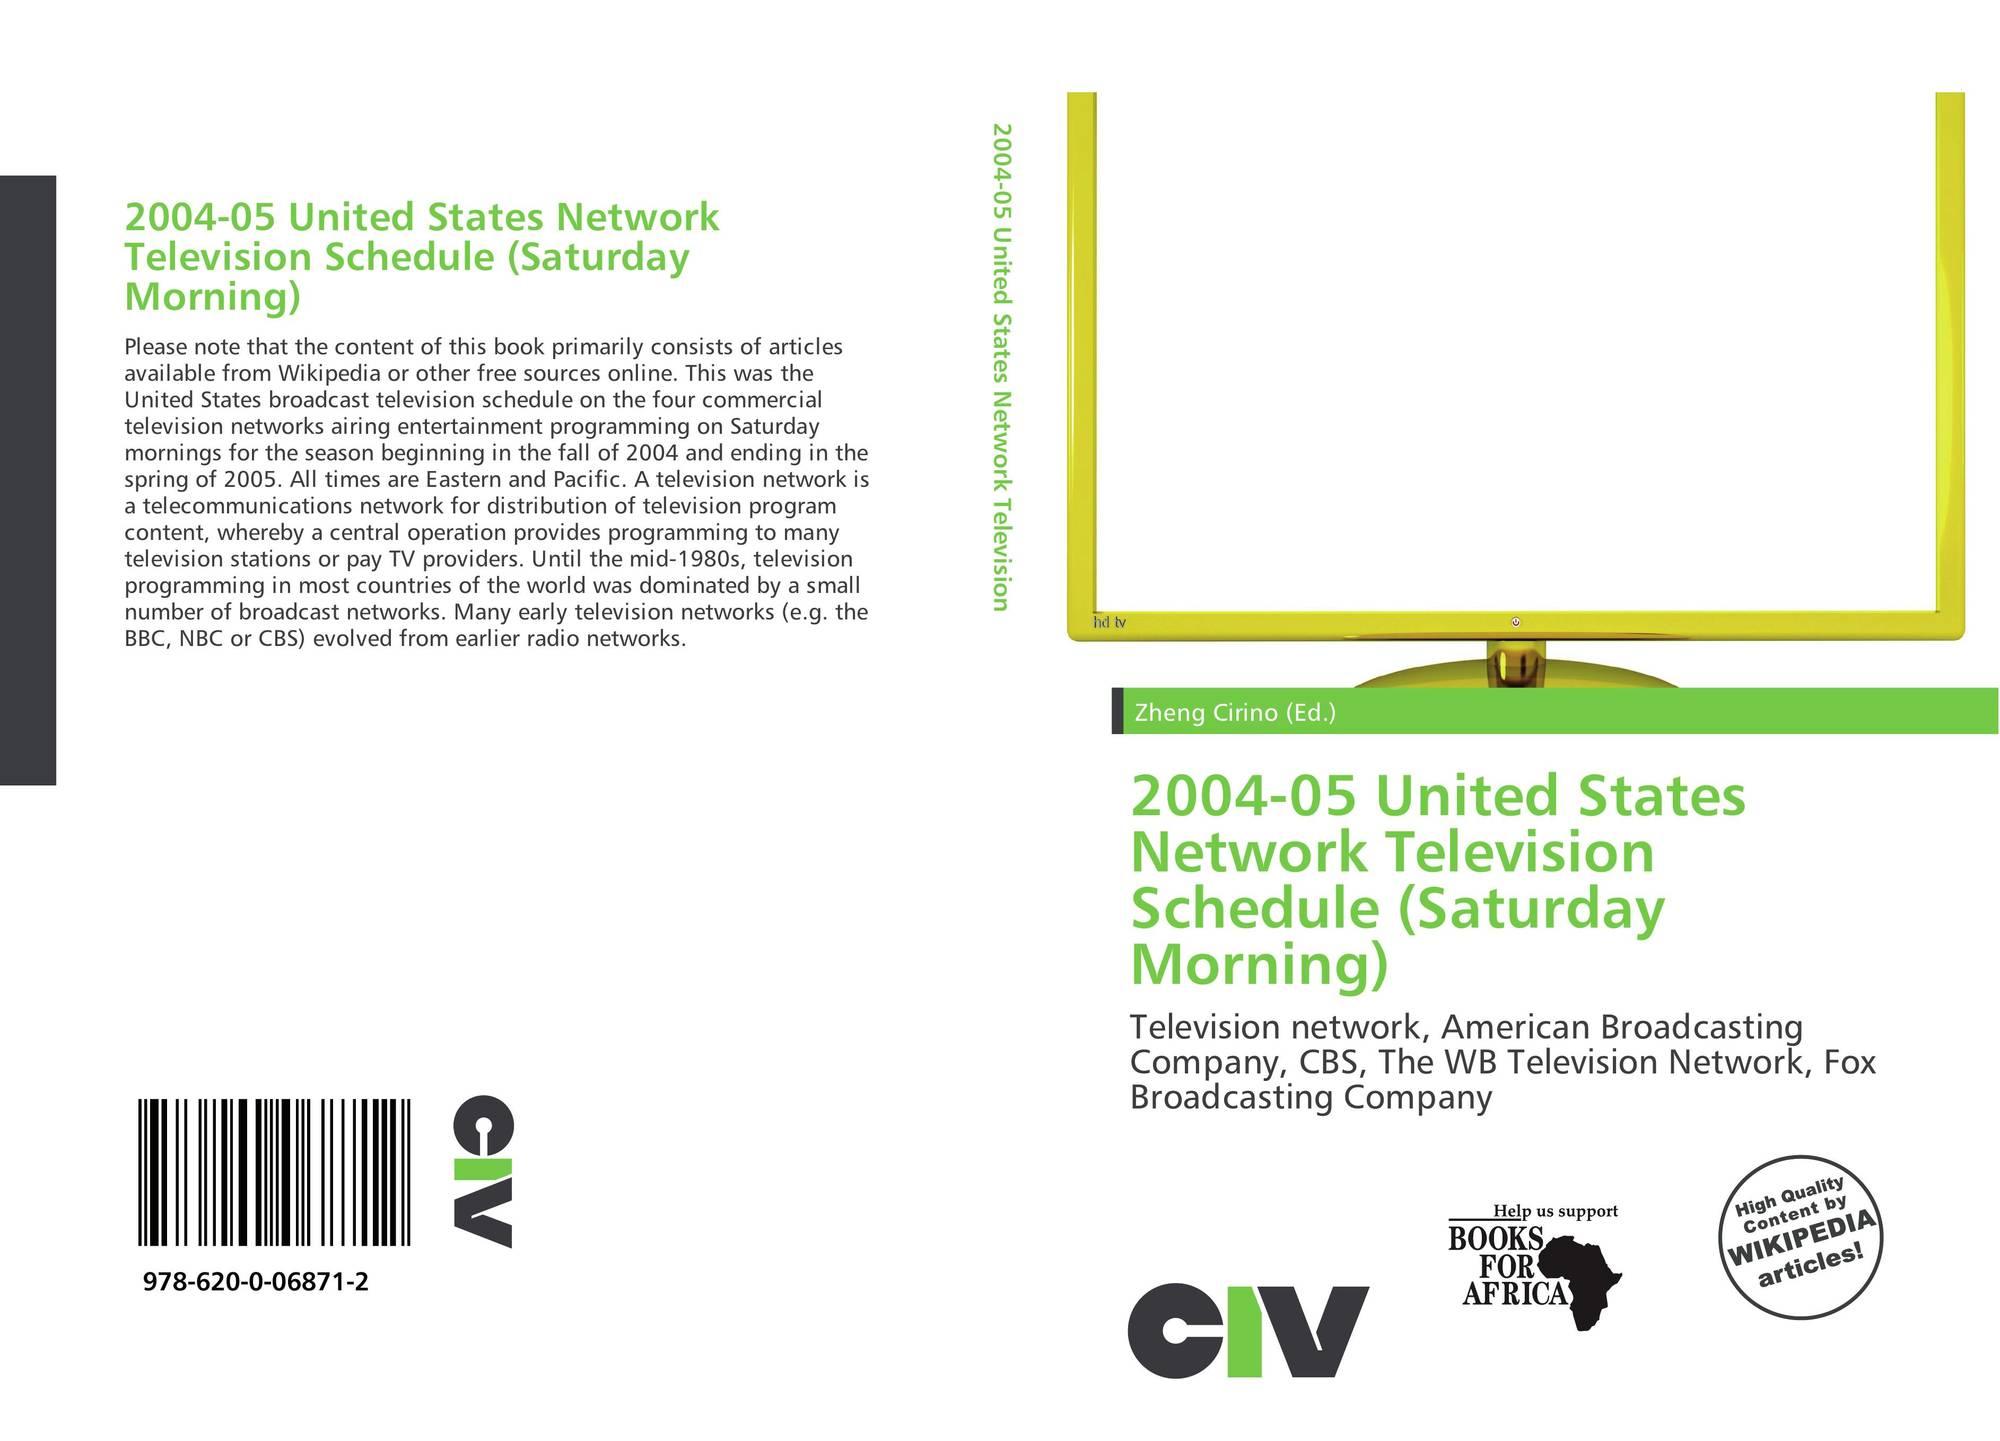 2004-05 United States Network Television Schedule (Saturday